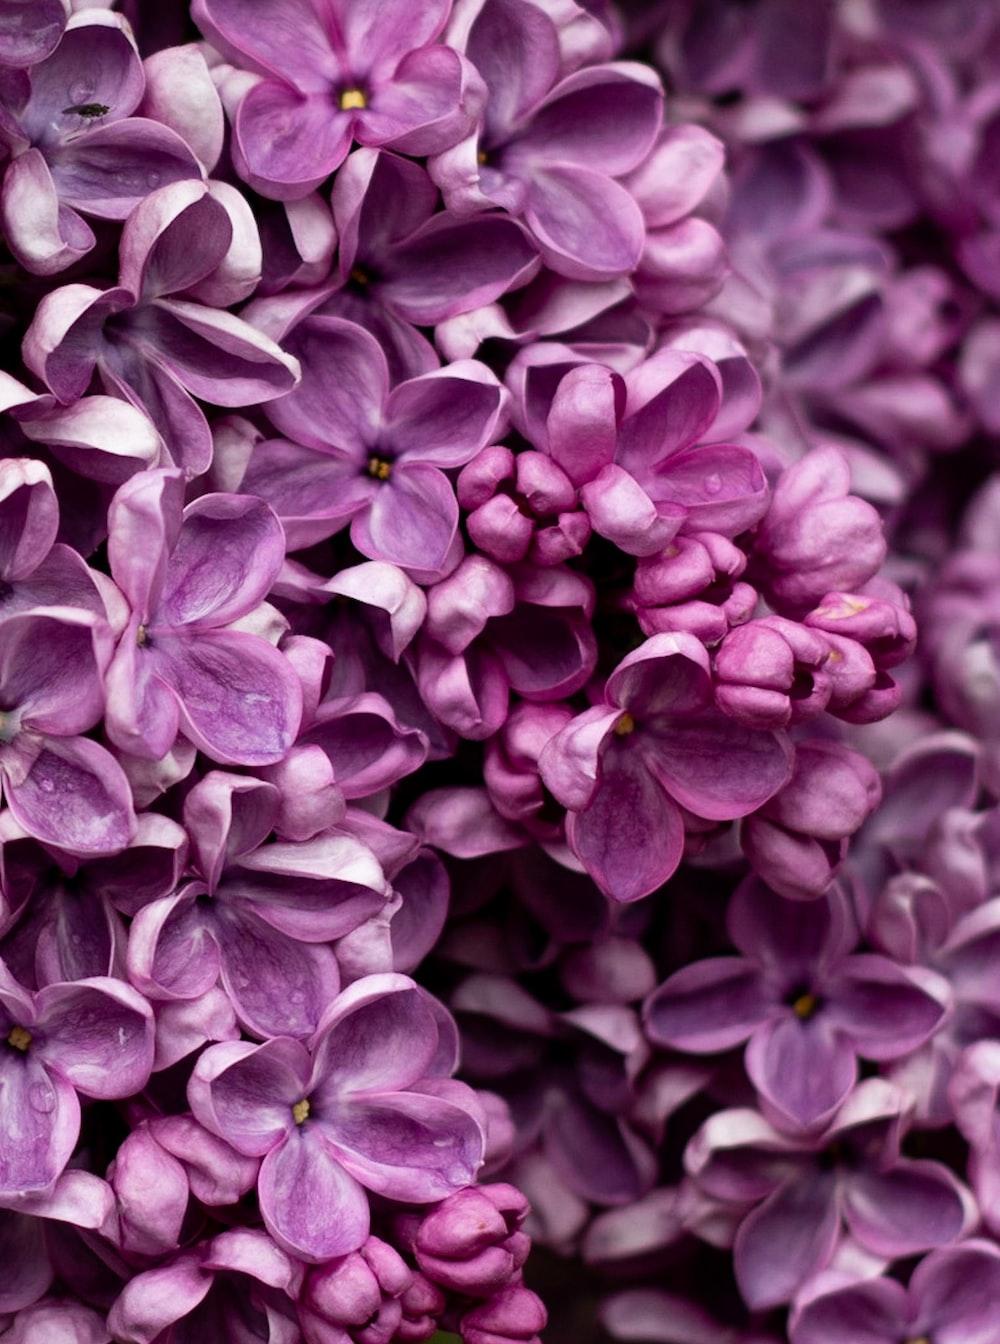 macro photography of purple flower